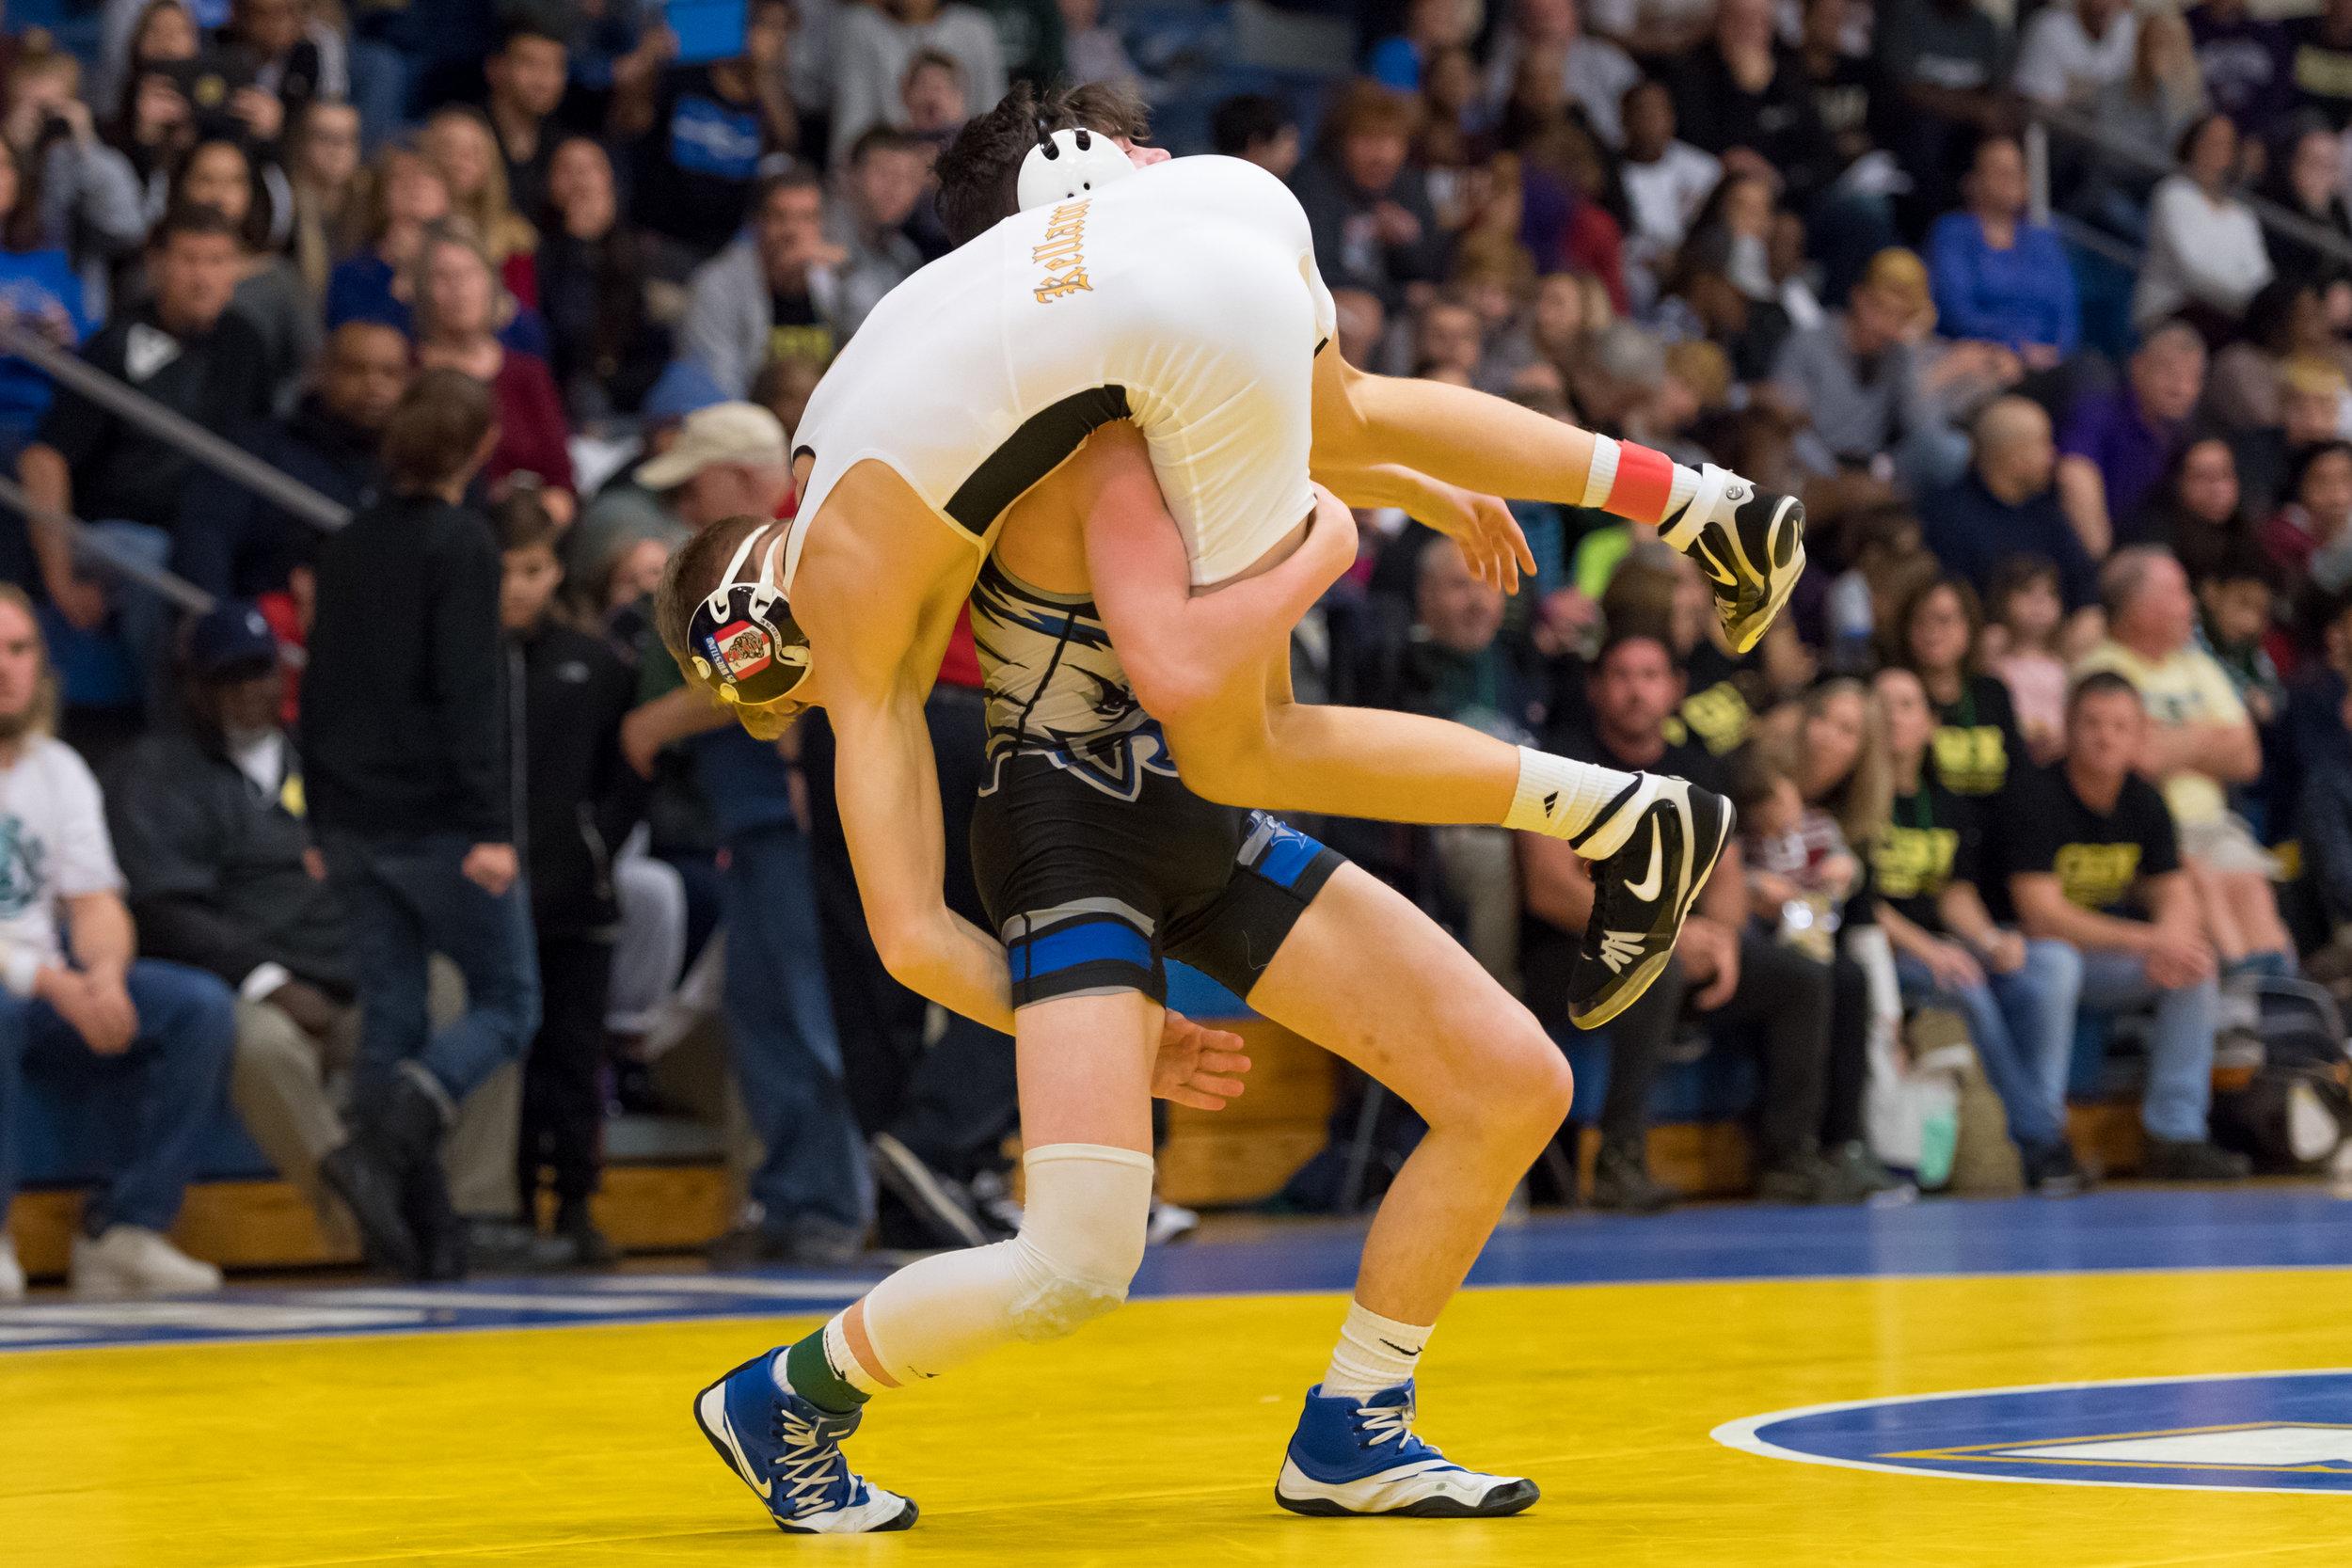 Landstown's Bryce Sanderlin picks up Kellam's Garrett Schrantz during the 126 pound match at the VHSL Region 6 State Championship held on Saturday, February 17, 2018 at Oscar Smith High School. Sanderlin won the 126 pound state championship.